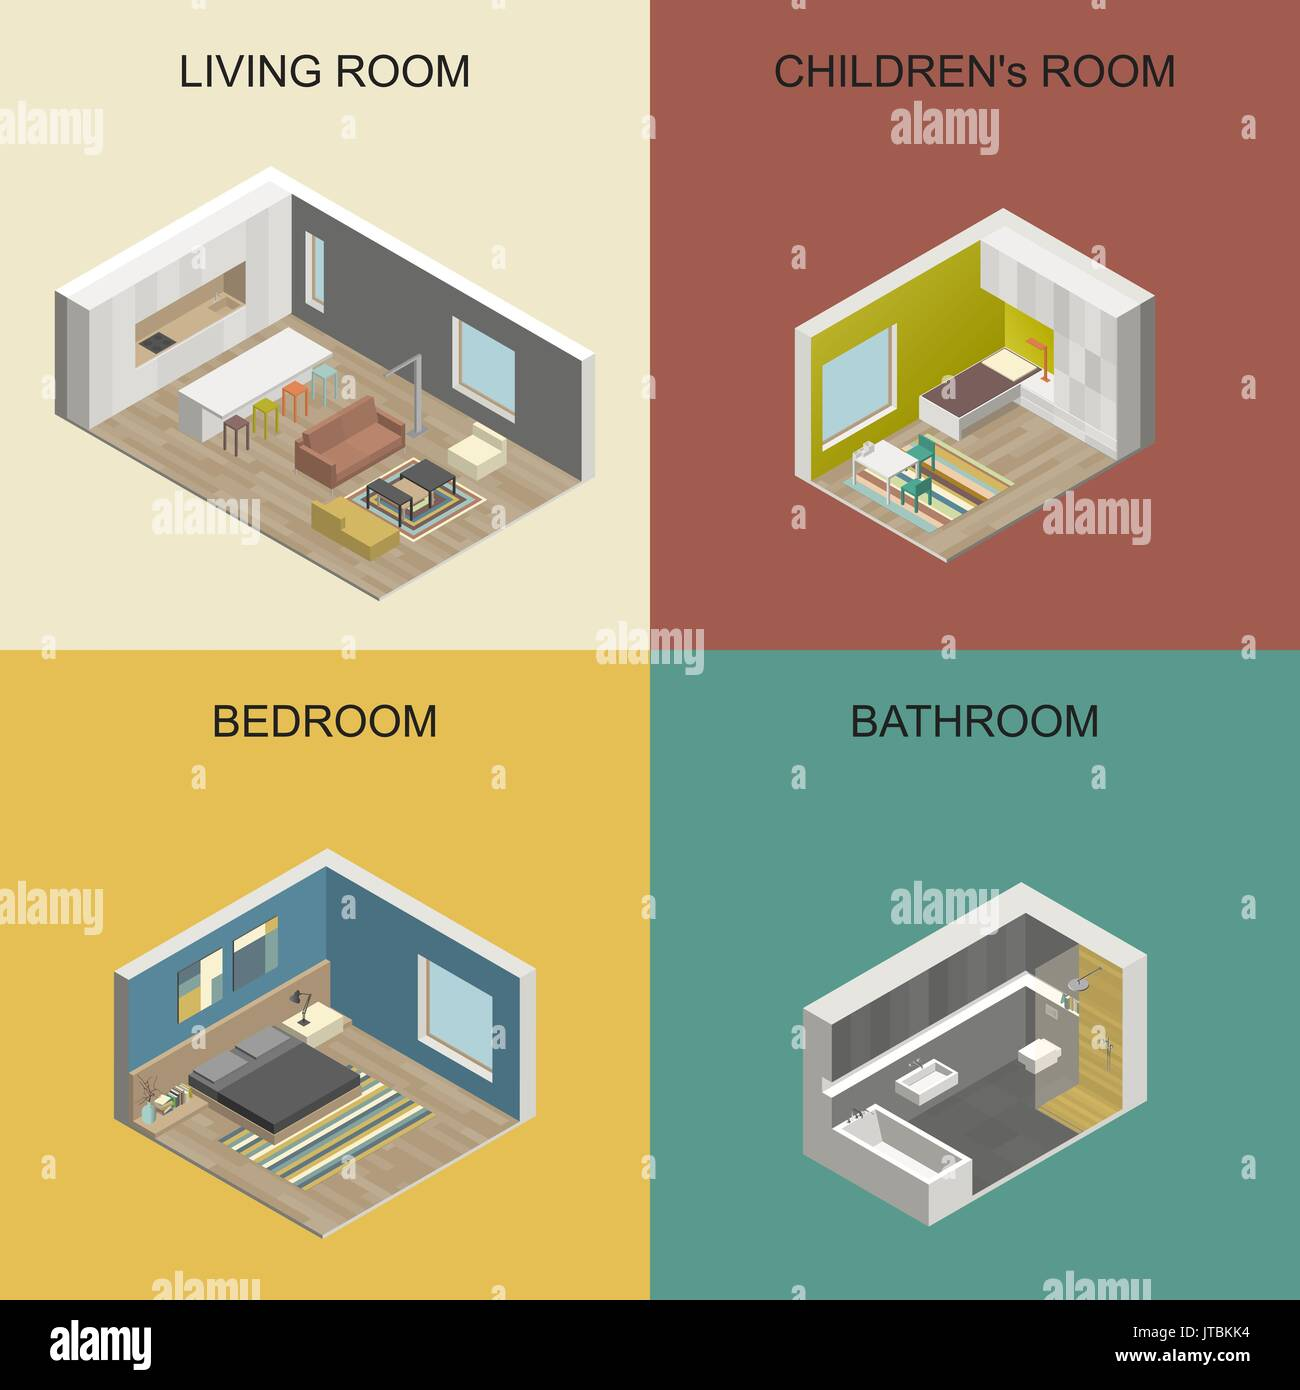 Isometric rooms - Stock Image